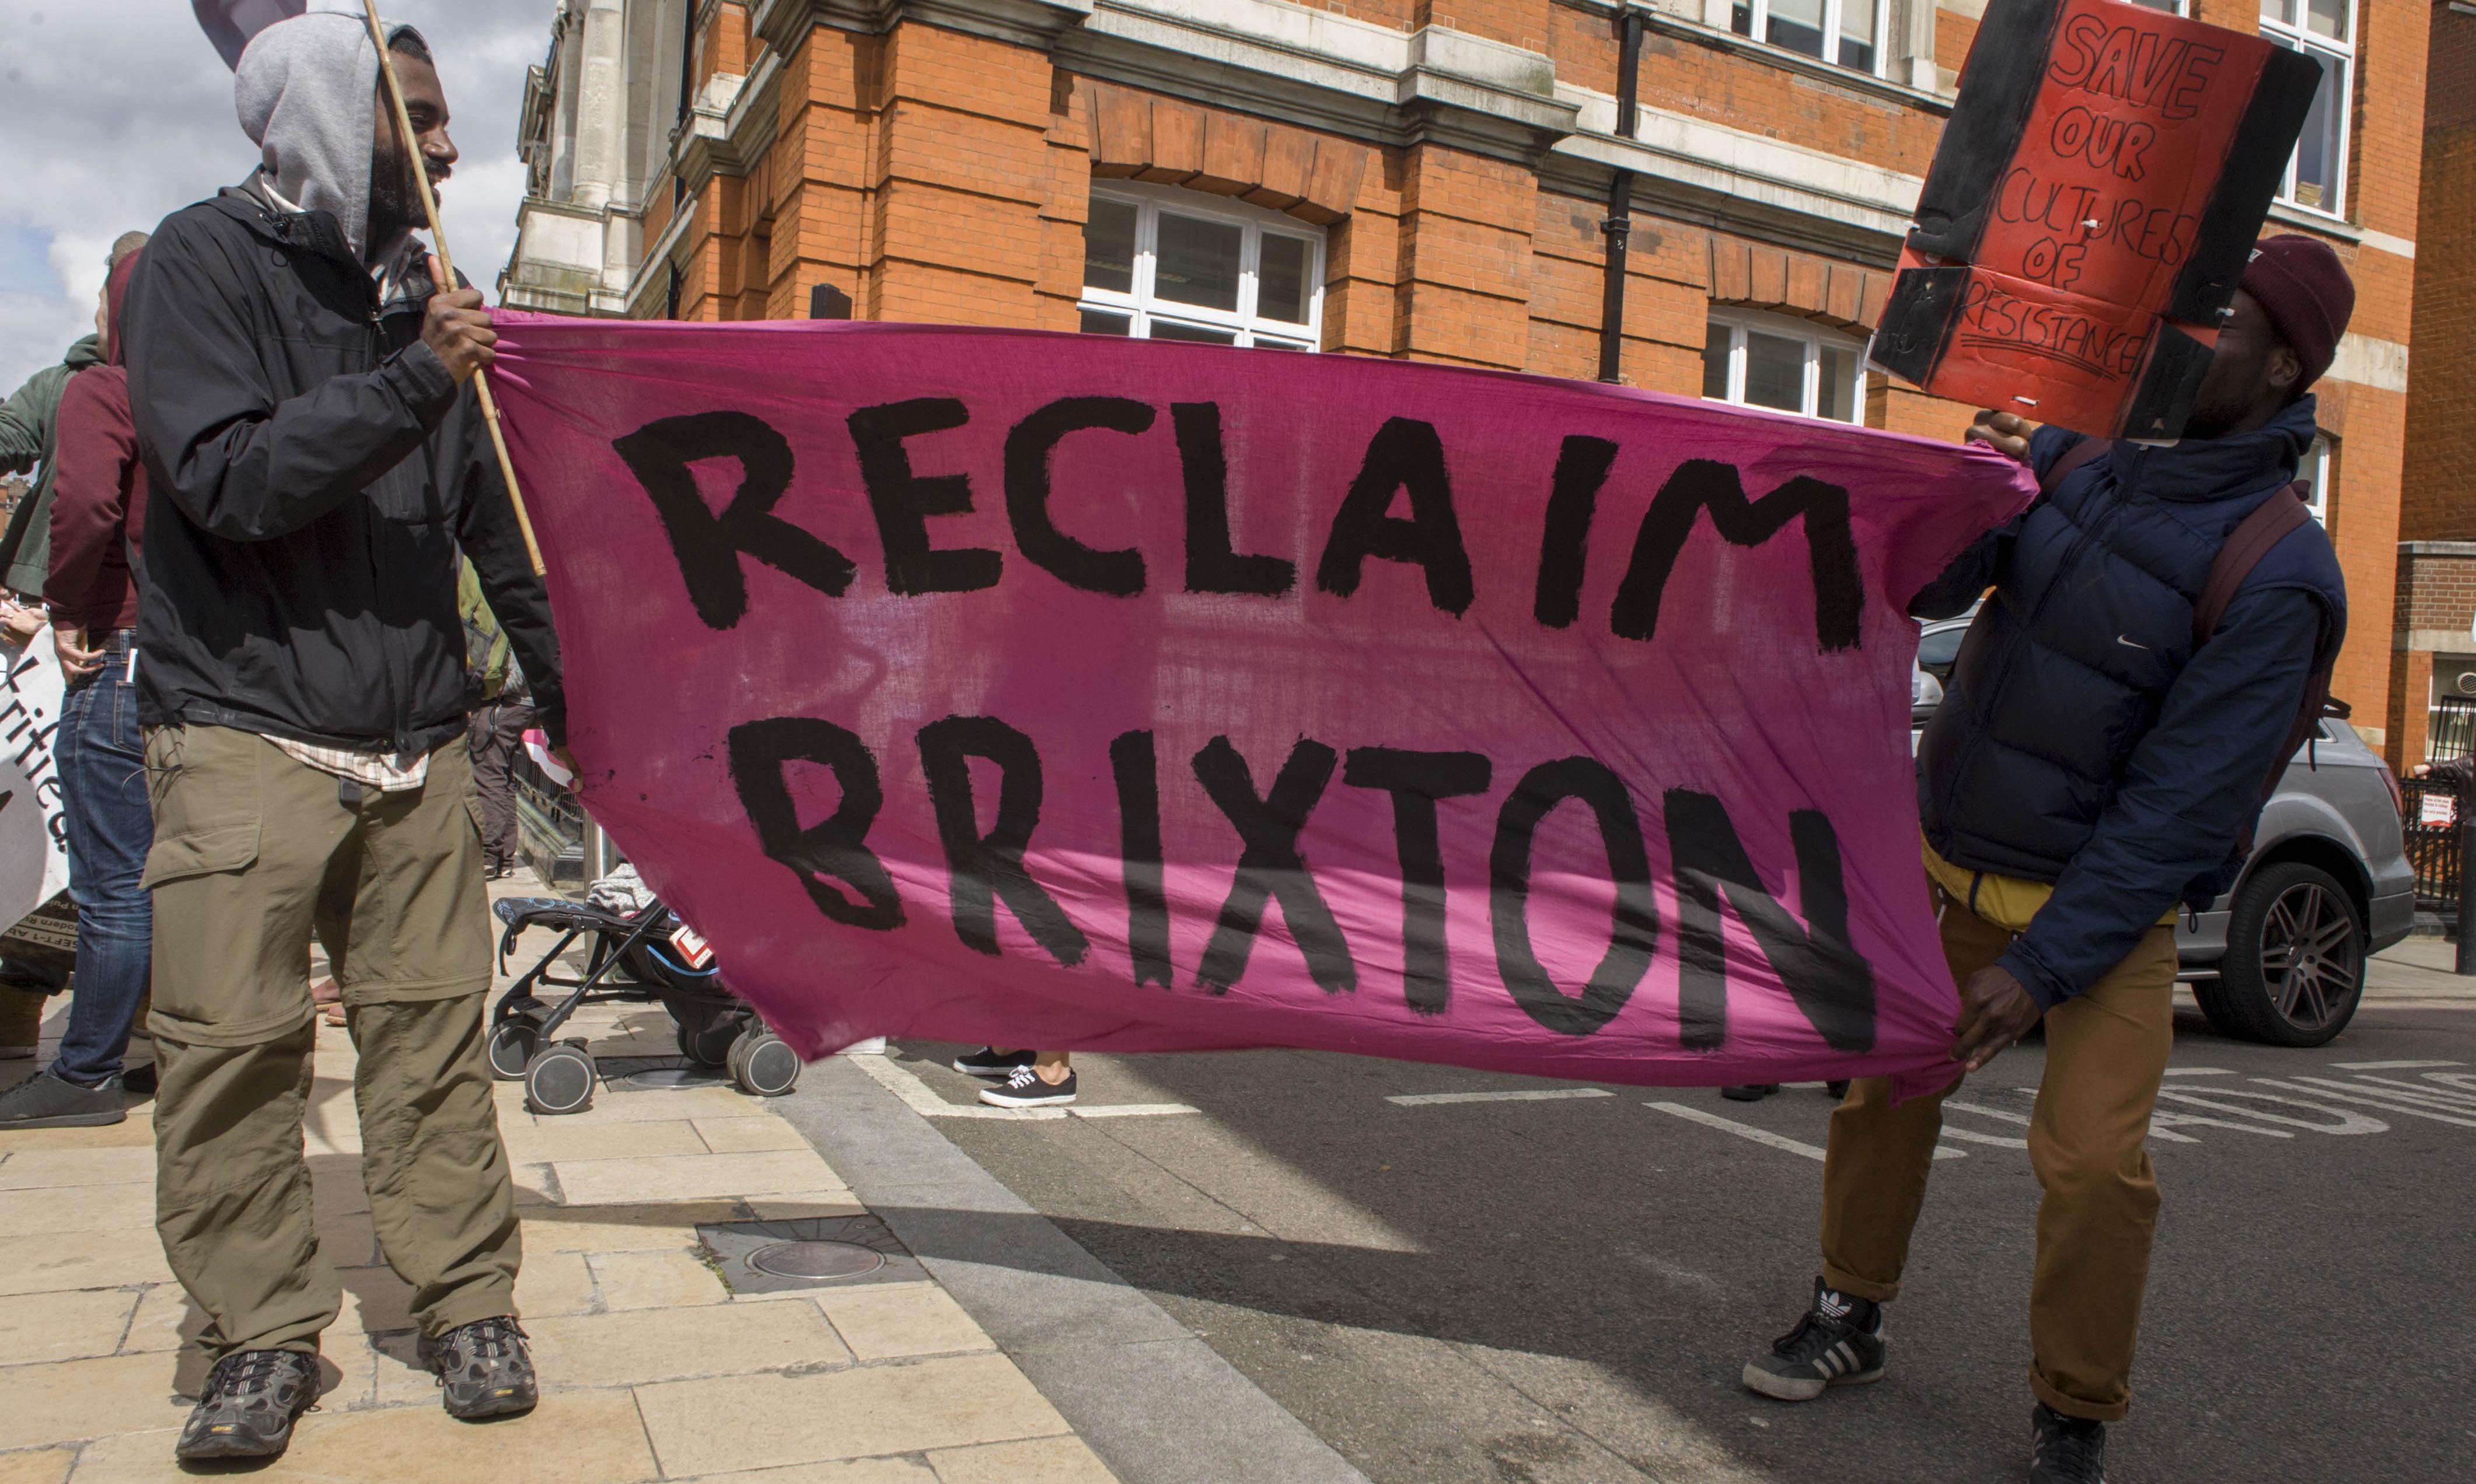 Brixton at standstill as crowds register frustration at gentrification